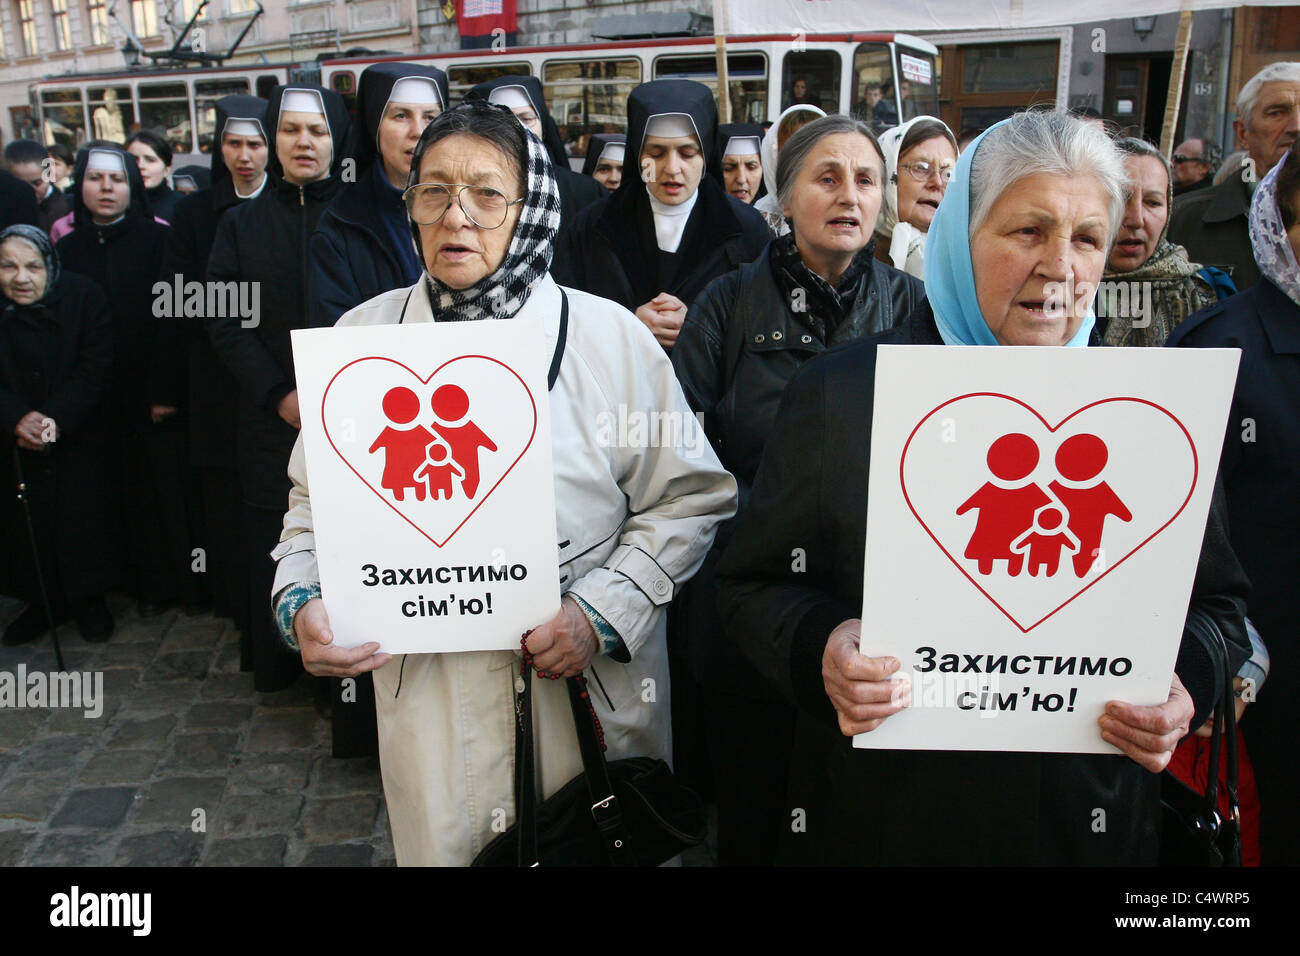 October 14, 2010. Homophobic protest in Lviv, Ukraine. - Stock Image